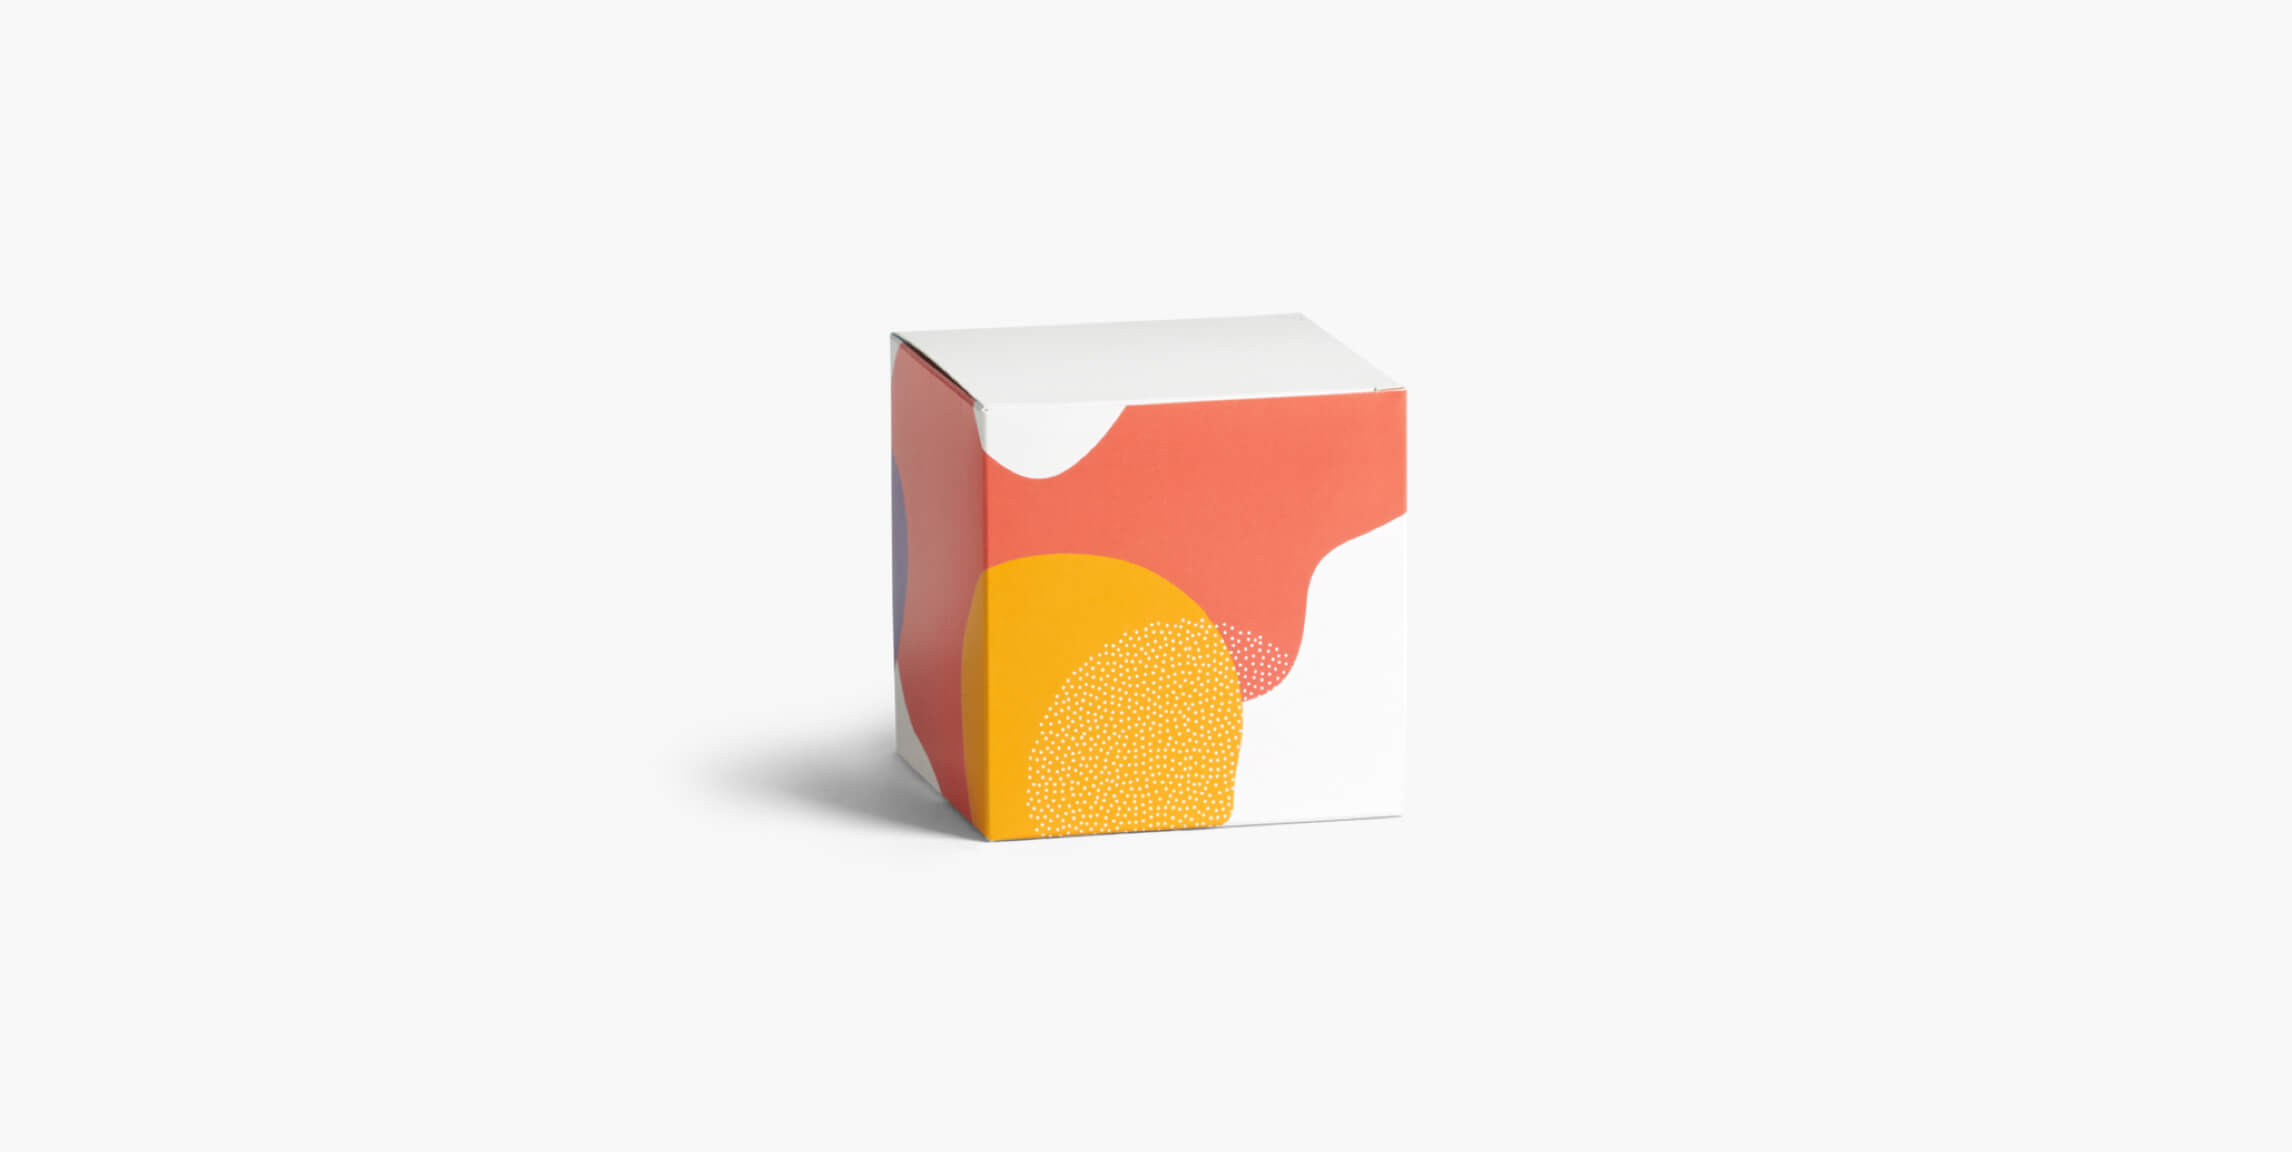 Classic Product Box - custom packaging - Packhelp